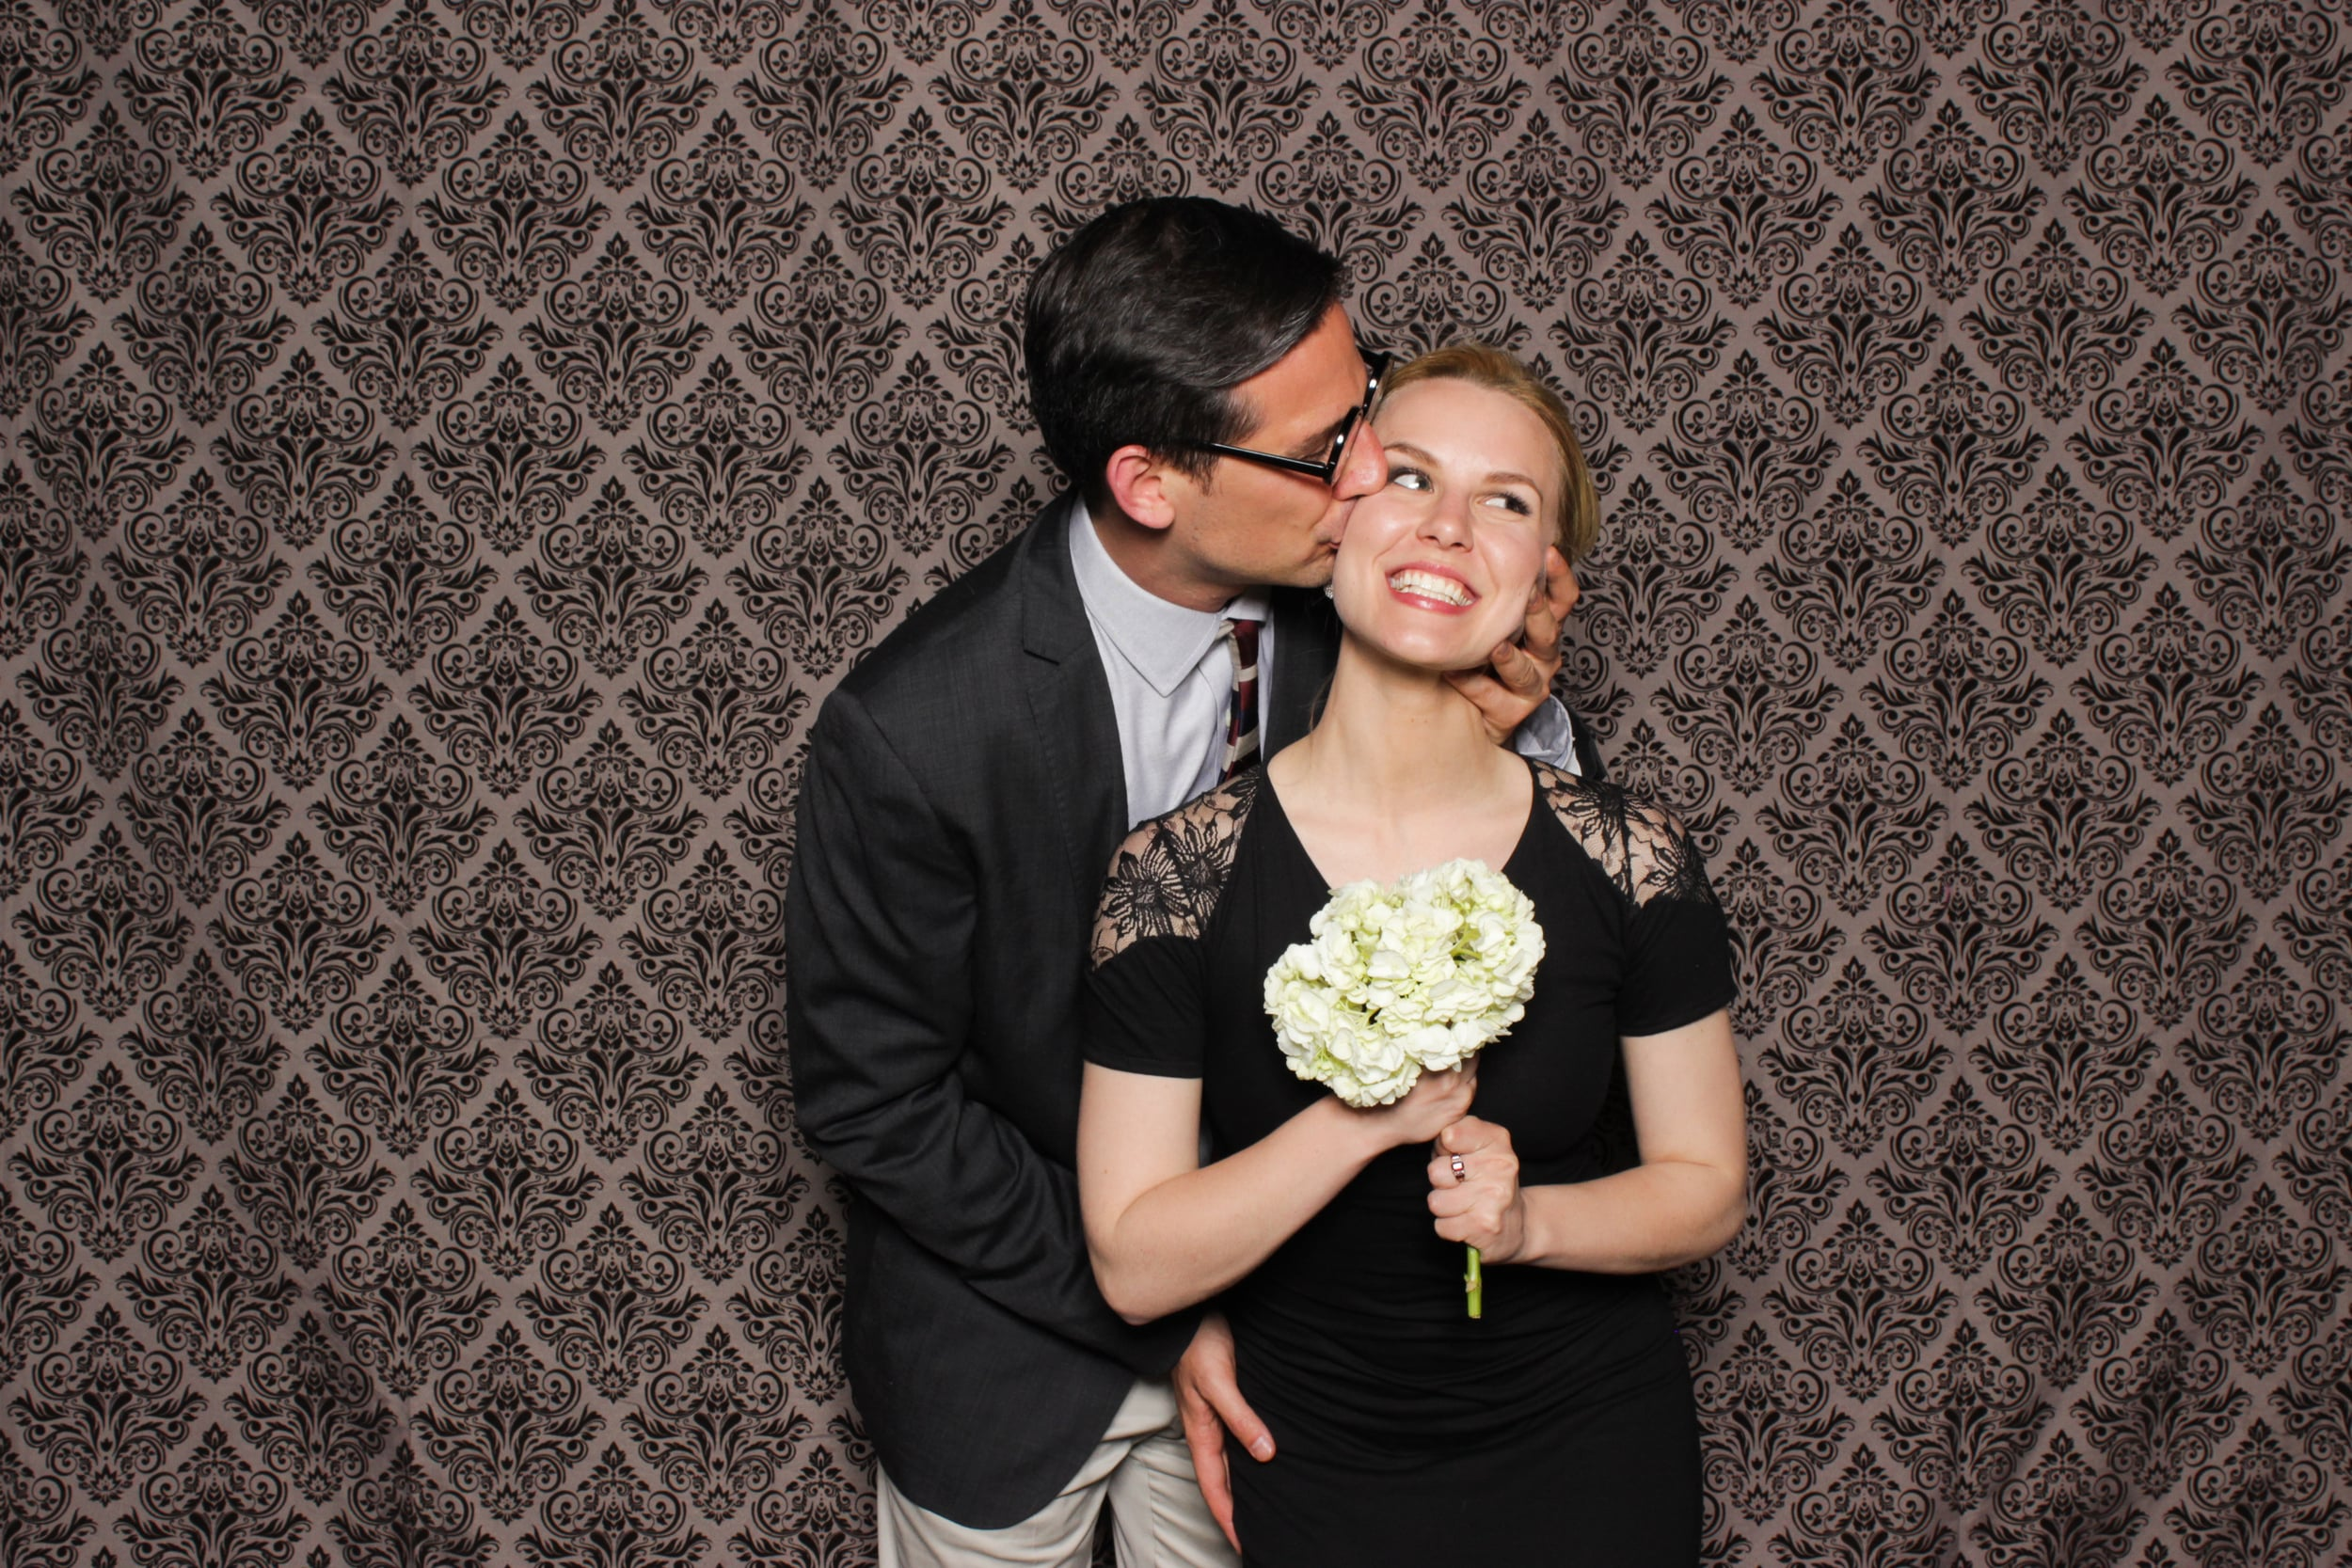 ottawa-wedding-photobooth-63.JPG